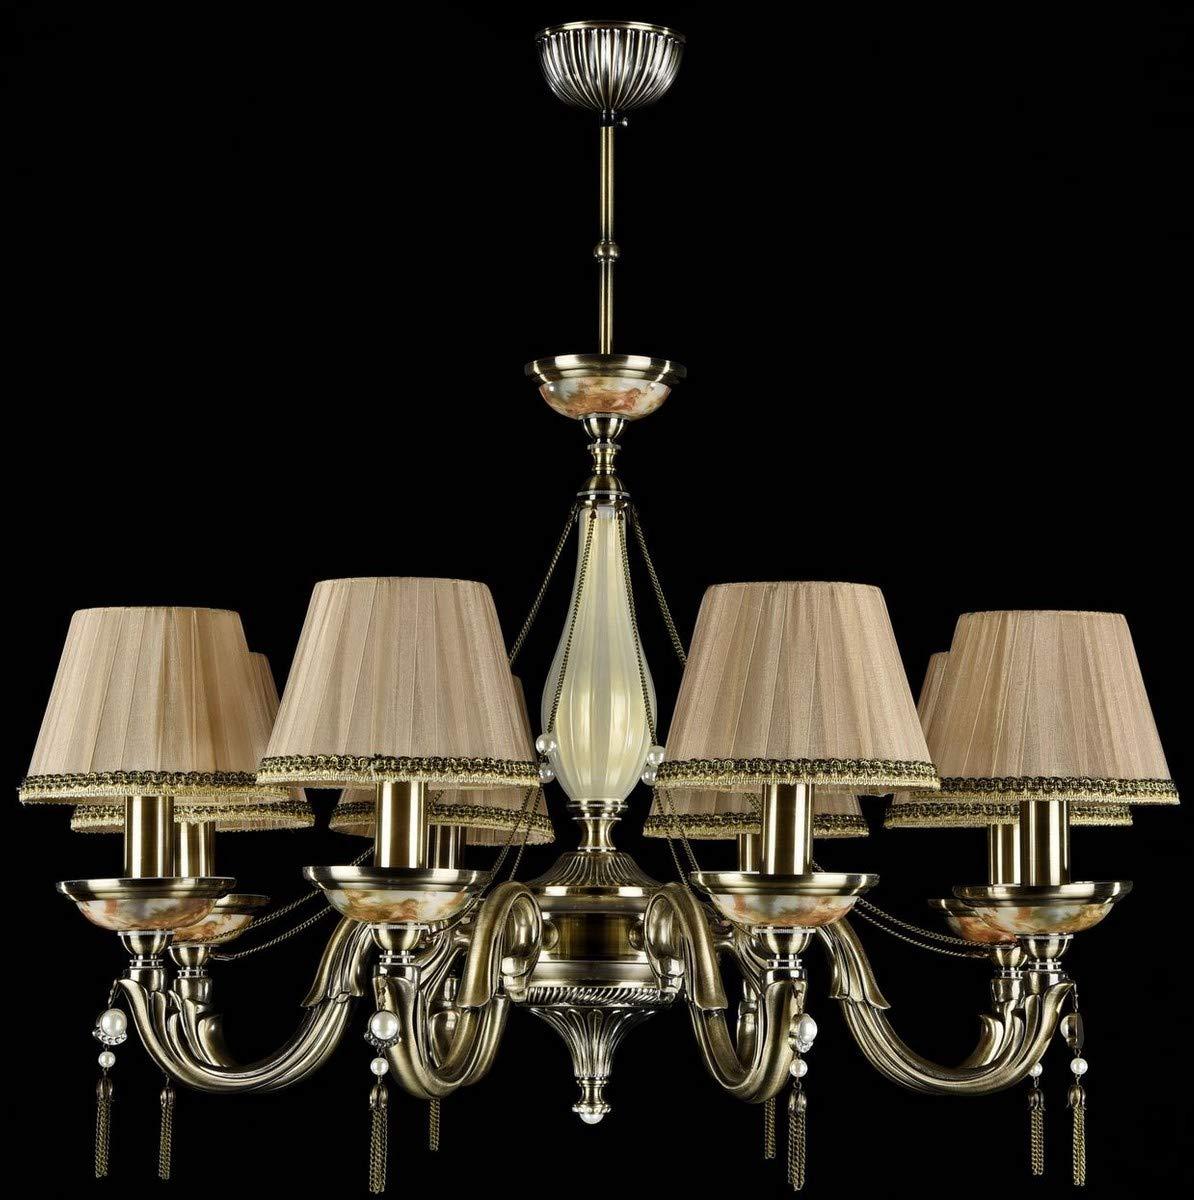 Casa Padrino Barock Kronleuchter Bronze Pfirsichfarben Ø 77 77 77 x H. 75 cm - Prunkvoller Kronleuchter im Barockstil B07JMGB55Q | Rabatt  e8a31b